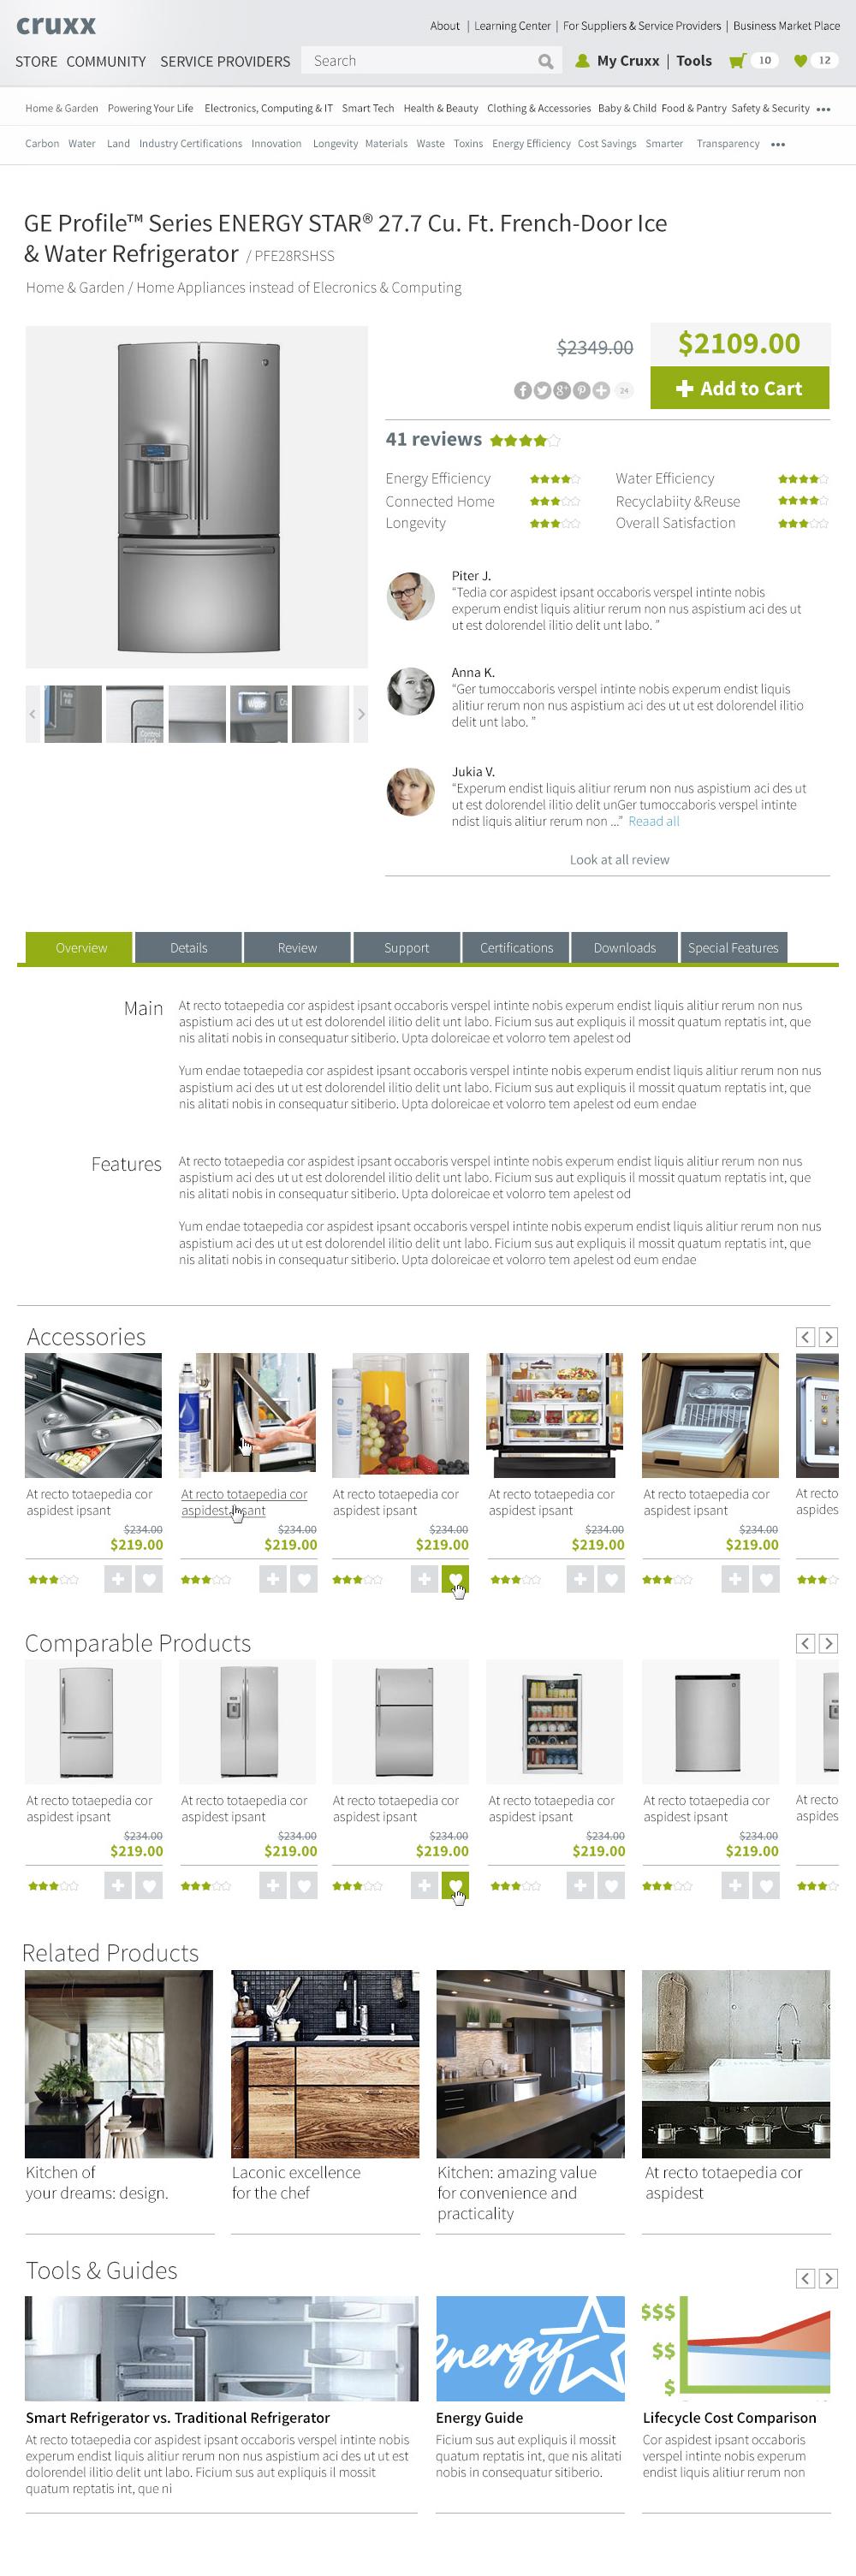 cruxx_b2c_Product.jpg